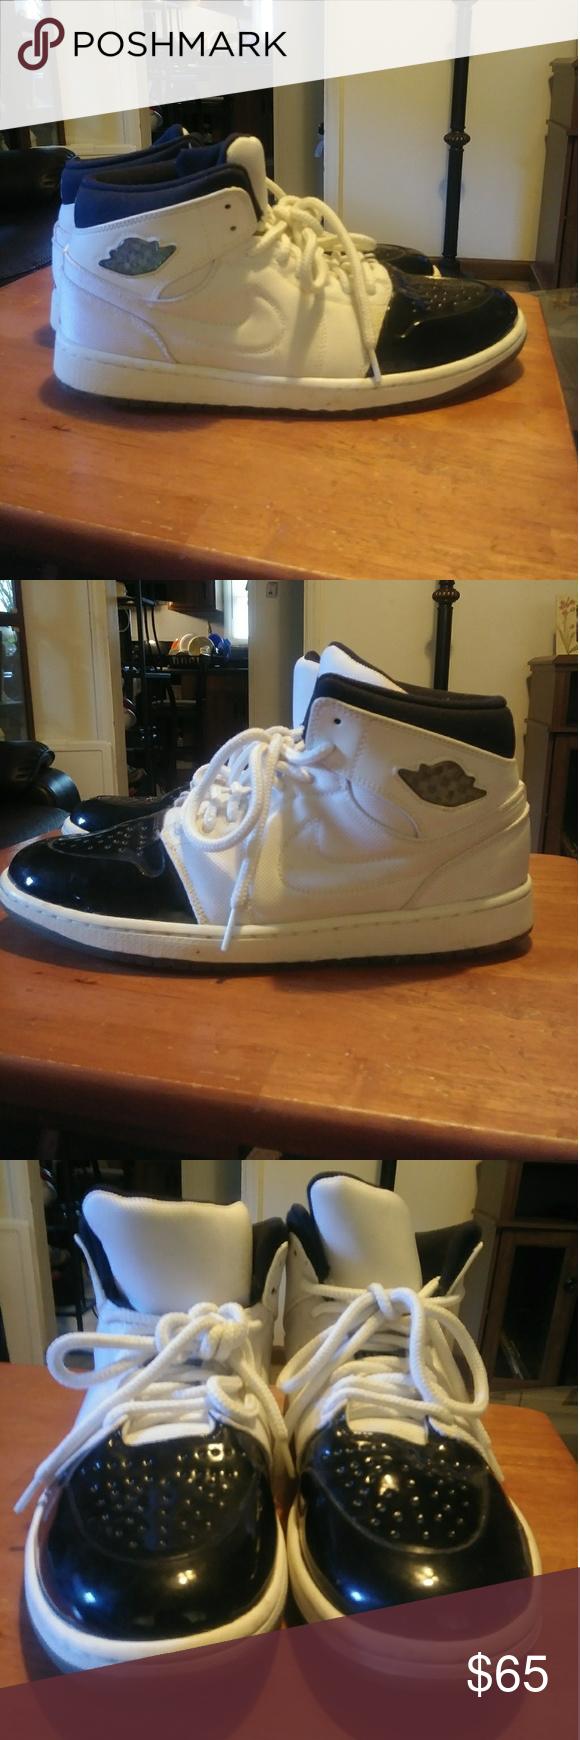 Air Jordan 95 Retro Shoes. Good condition Size 11 Retro